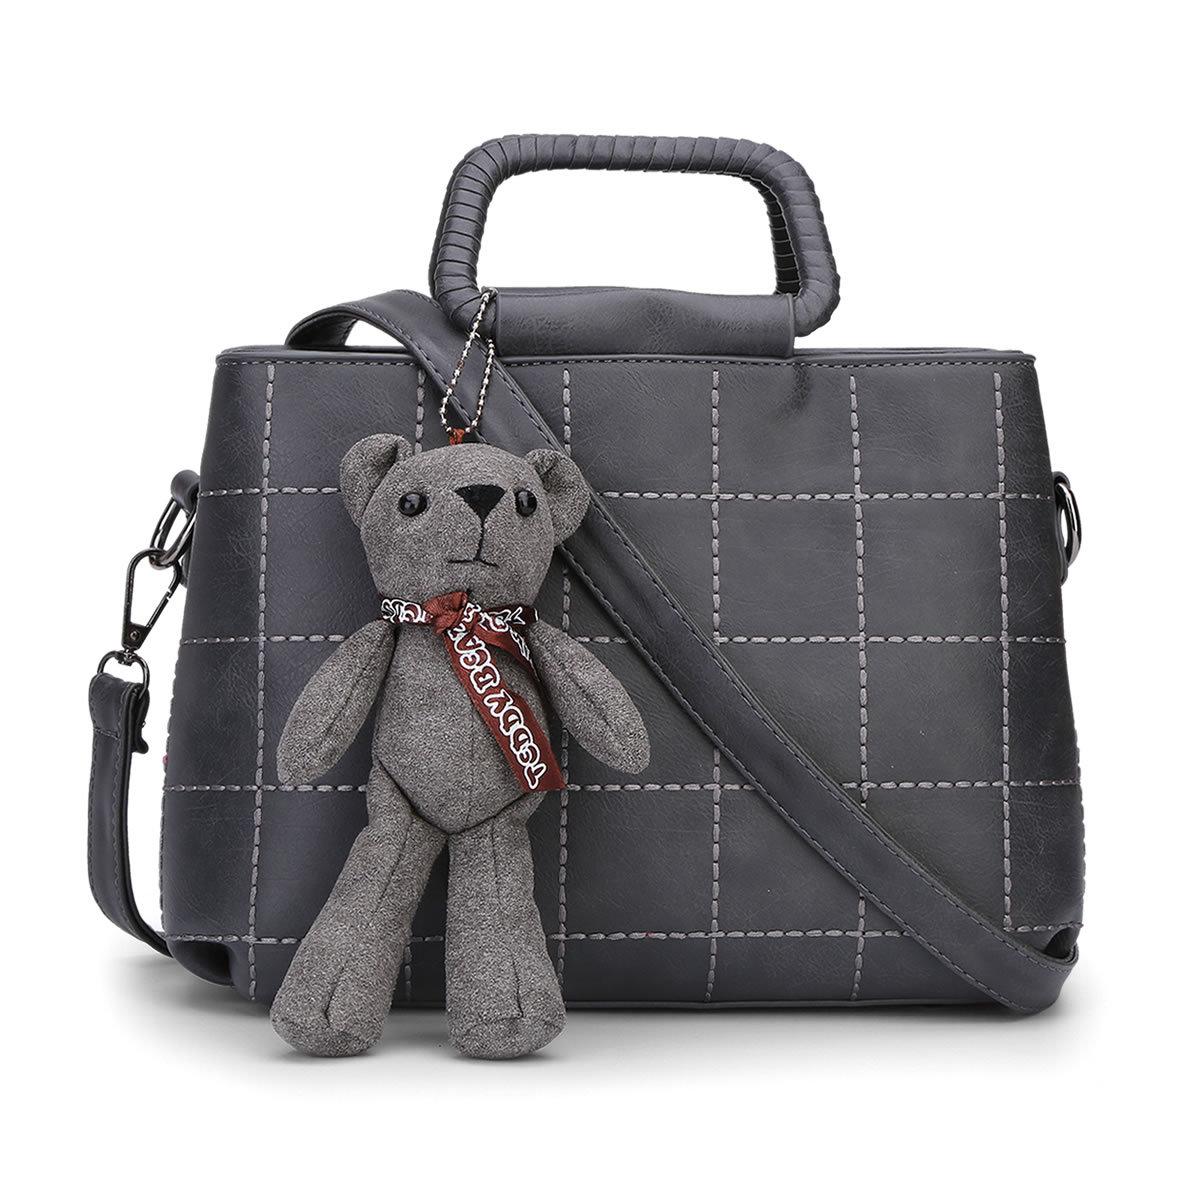 Spring New  Vintage Plaid Women Shoulder Bags With Cute Bear Toy  Korean Fashion Style Cute Women Bag  Messenger Handbag Q5